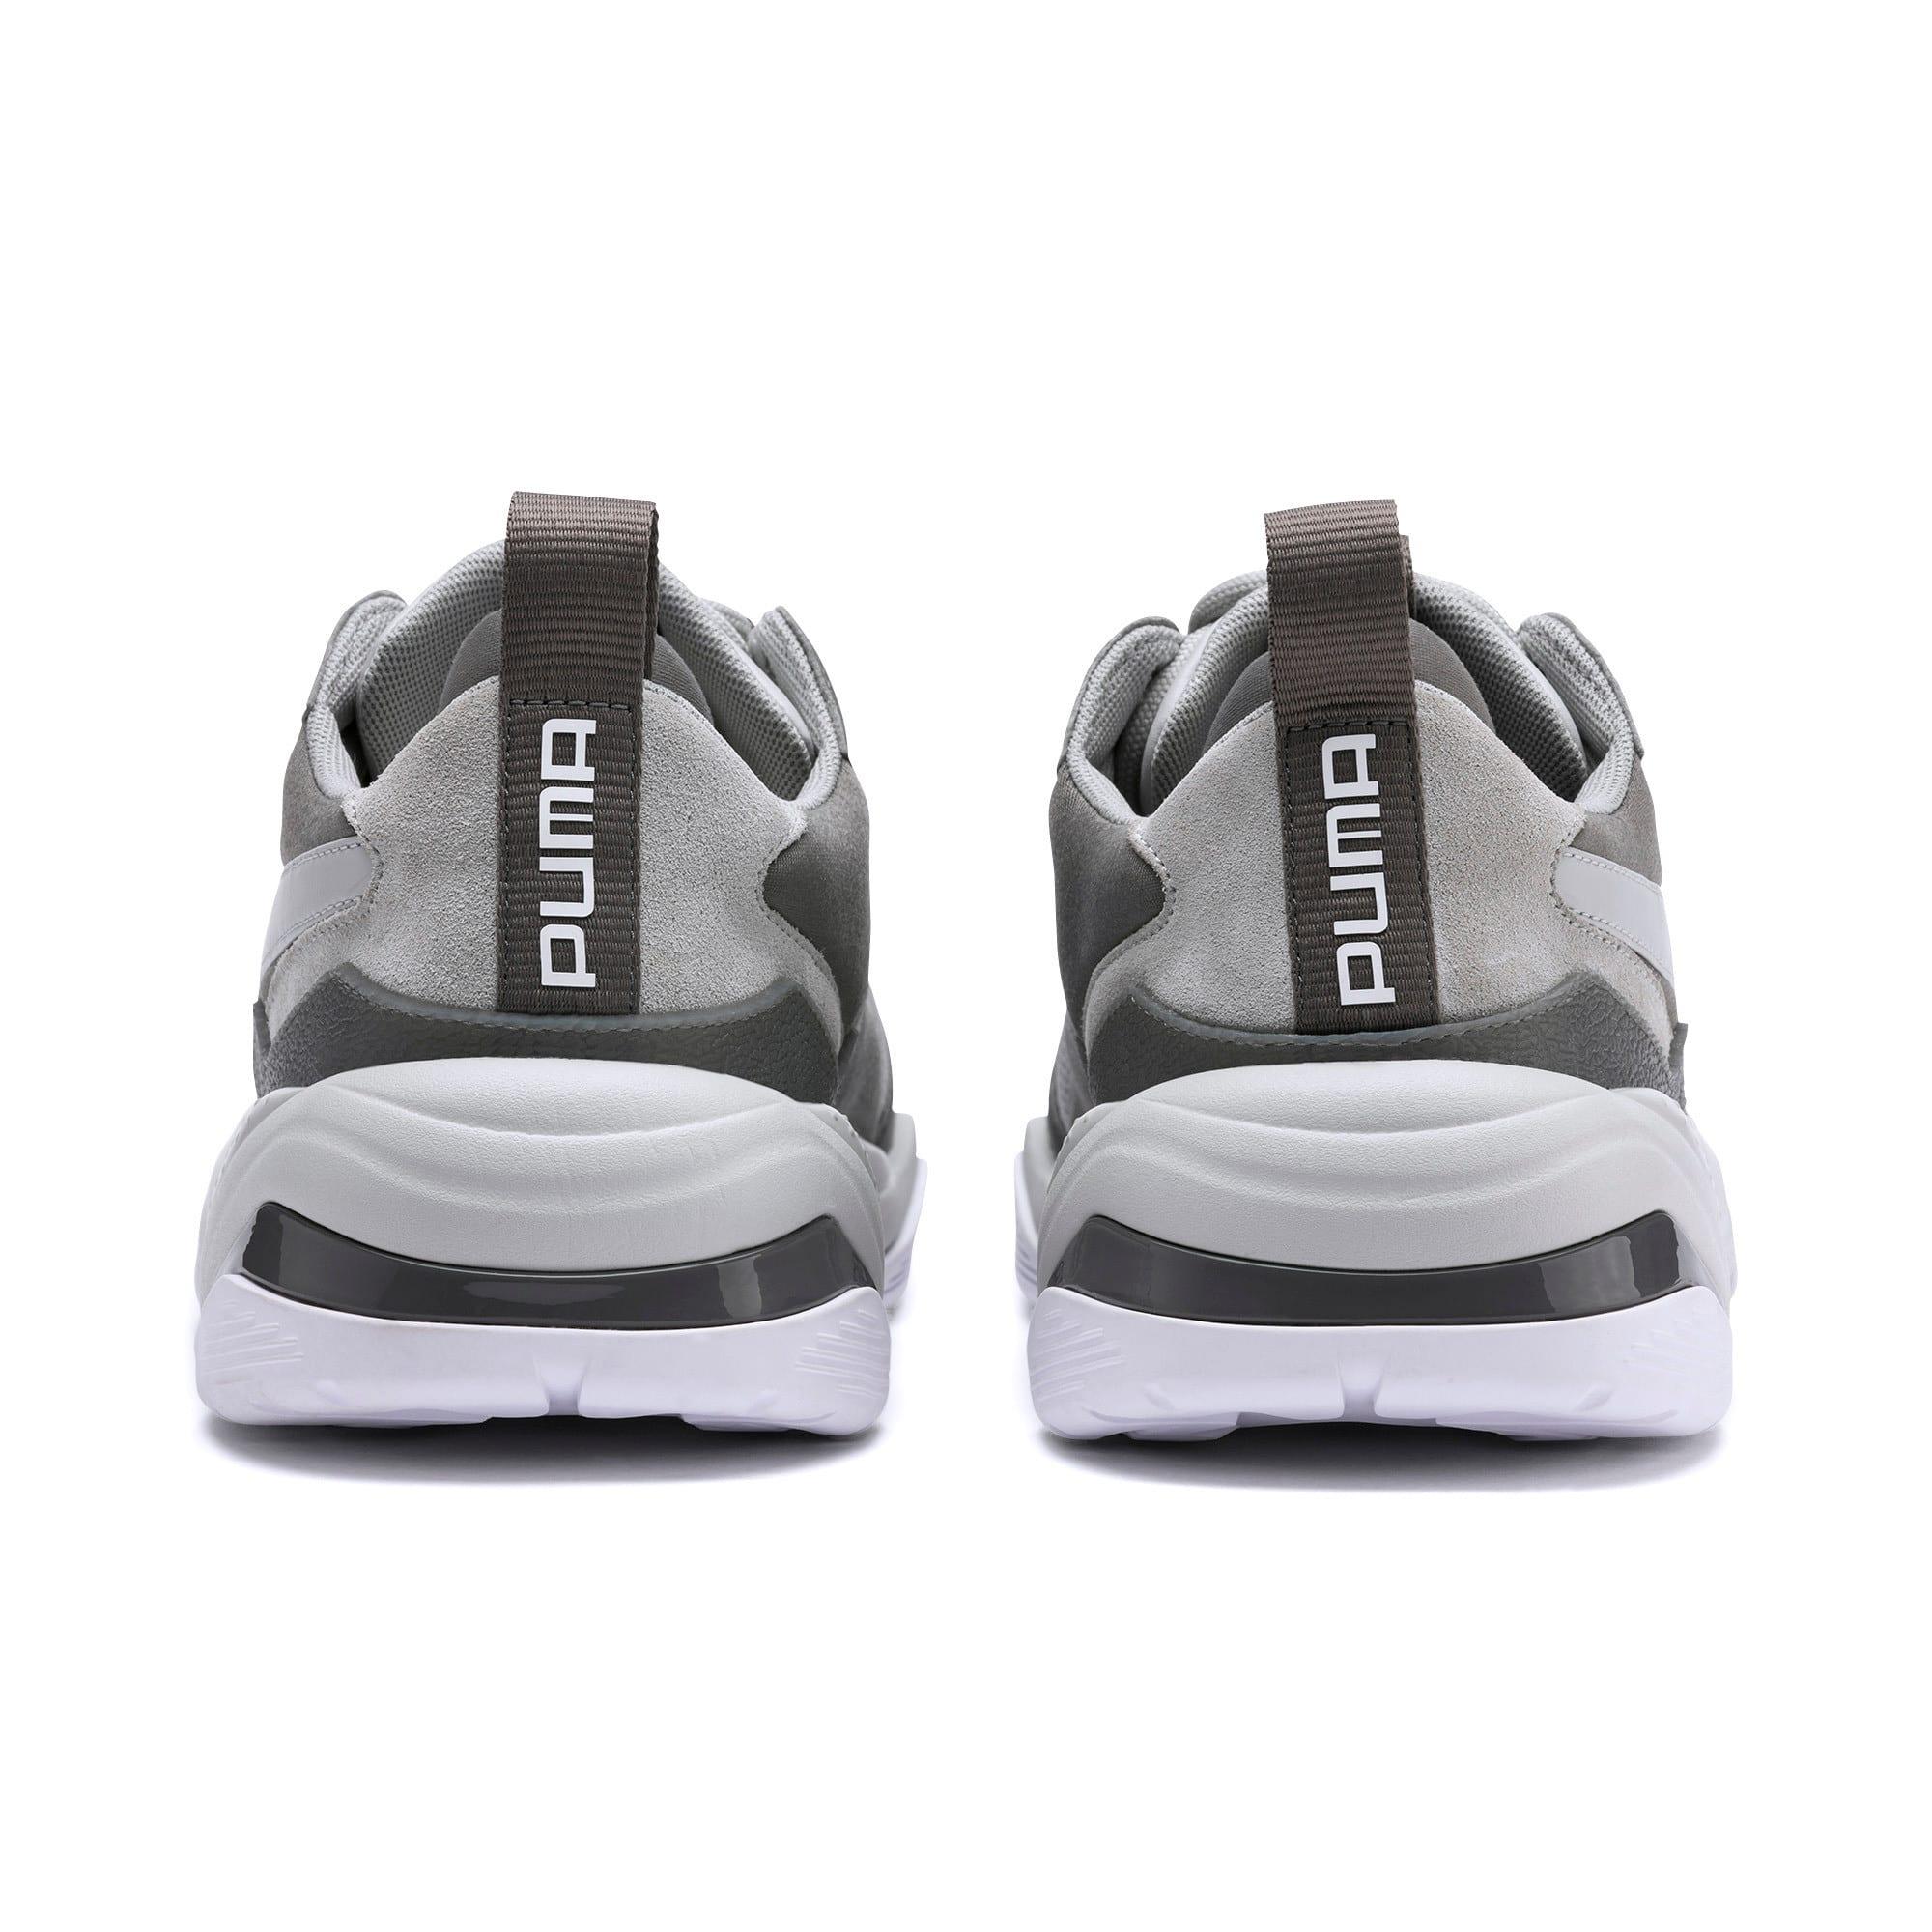 Thumbnail 4 of Thunder Fashion 2.0 Sneakers, High Rise-CASTLEROCK, medium